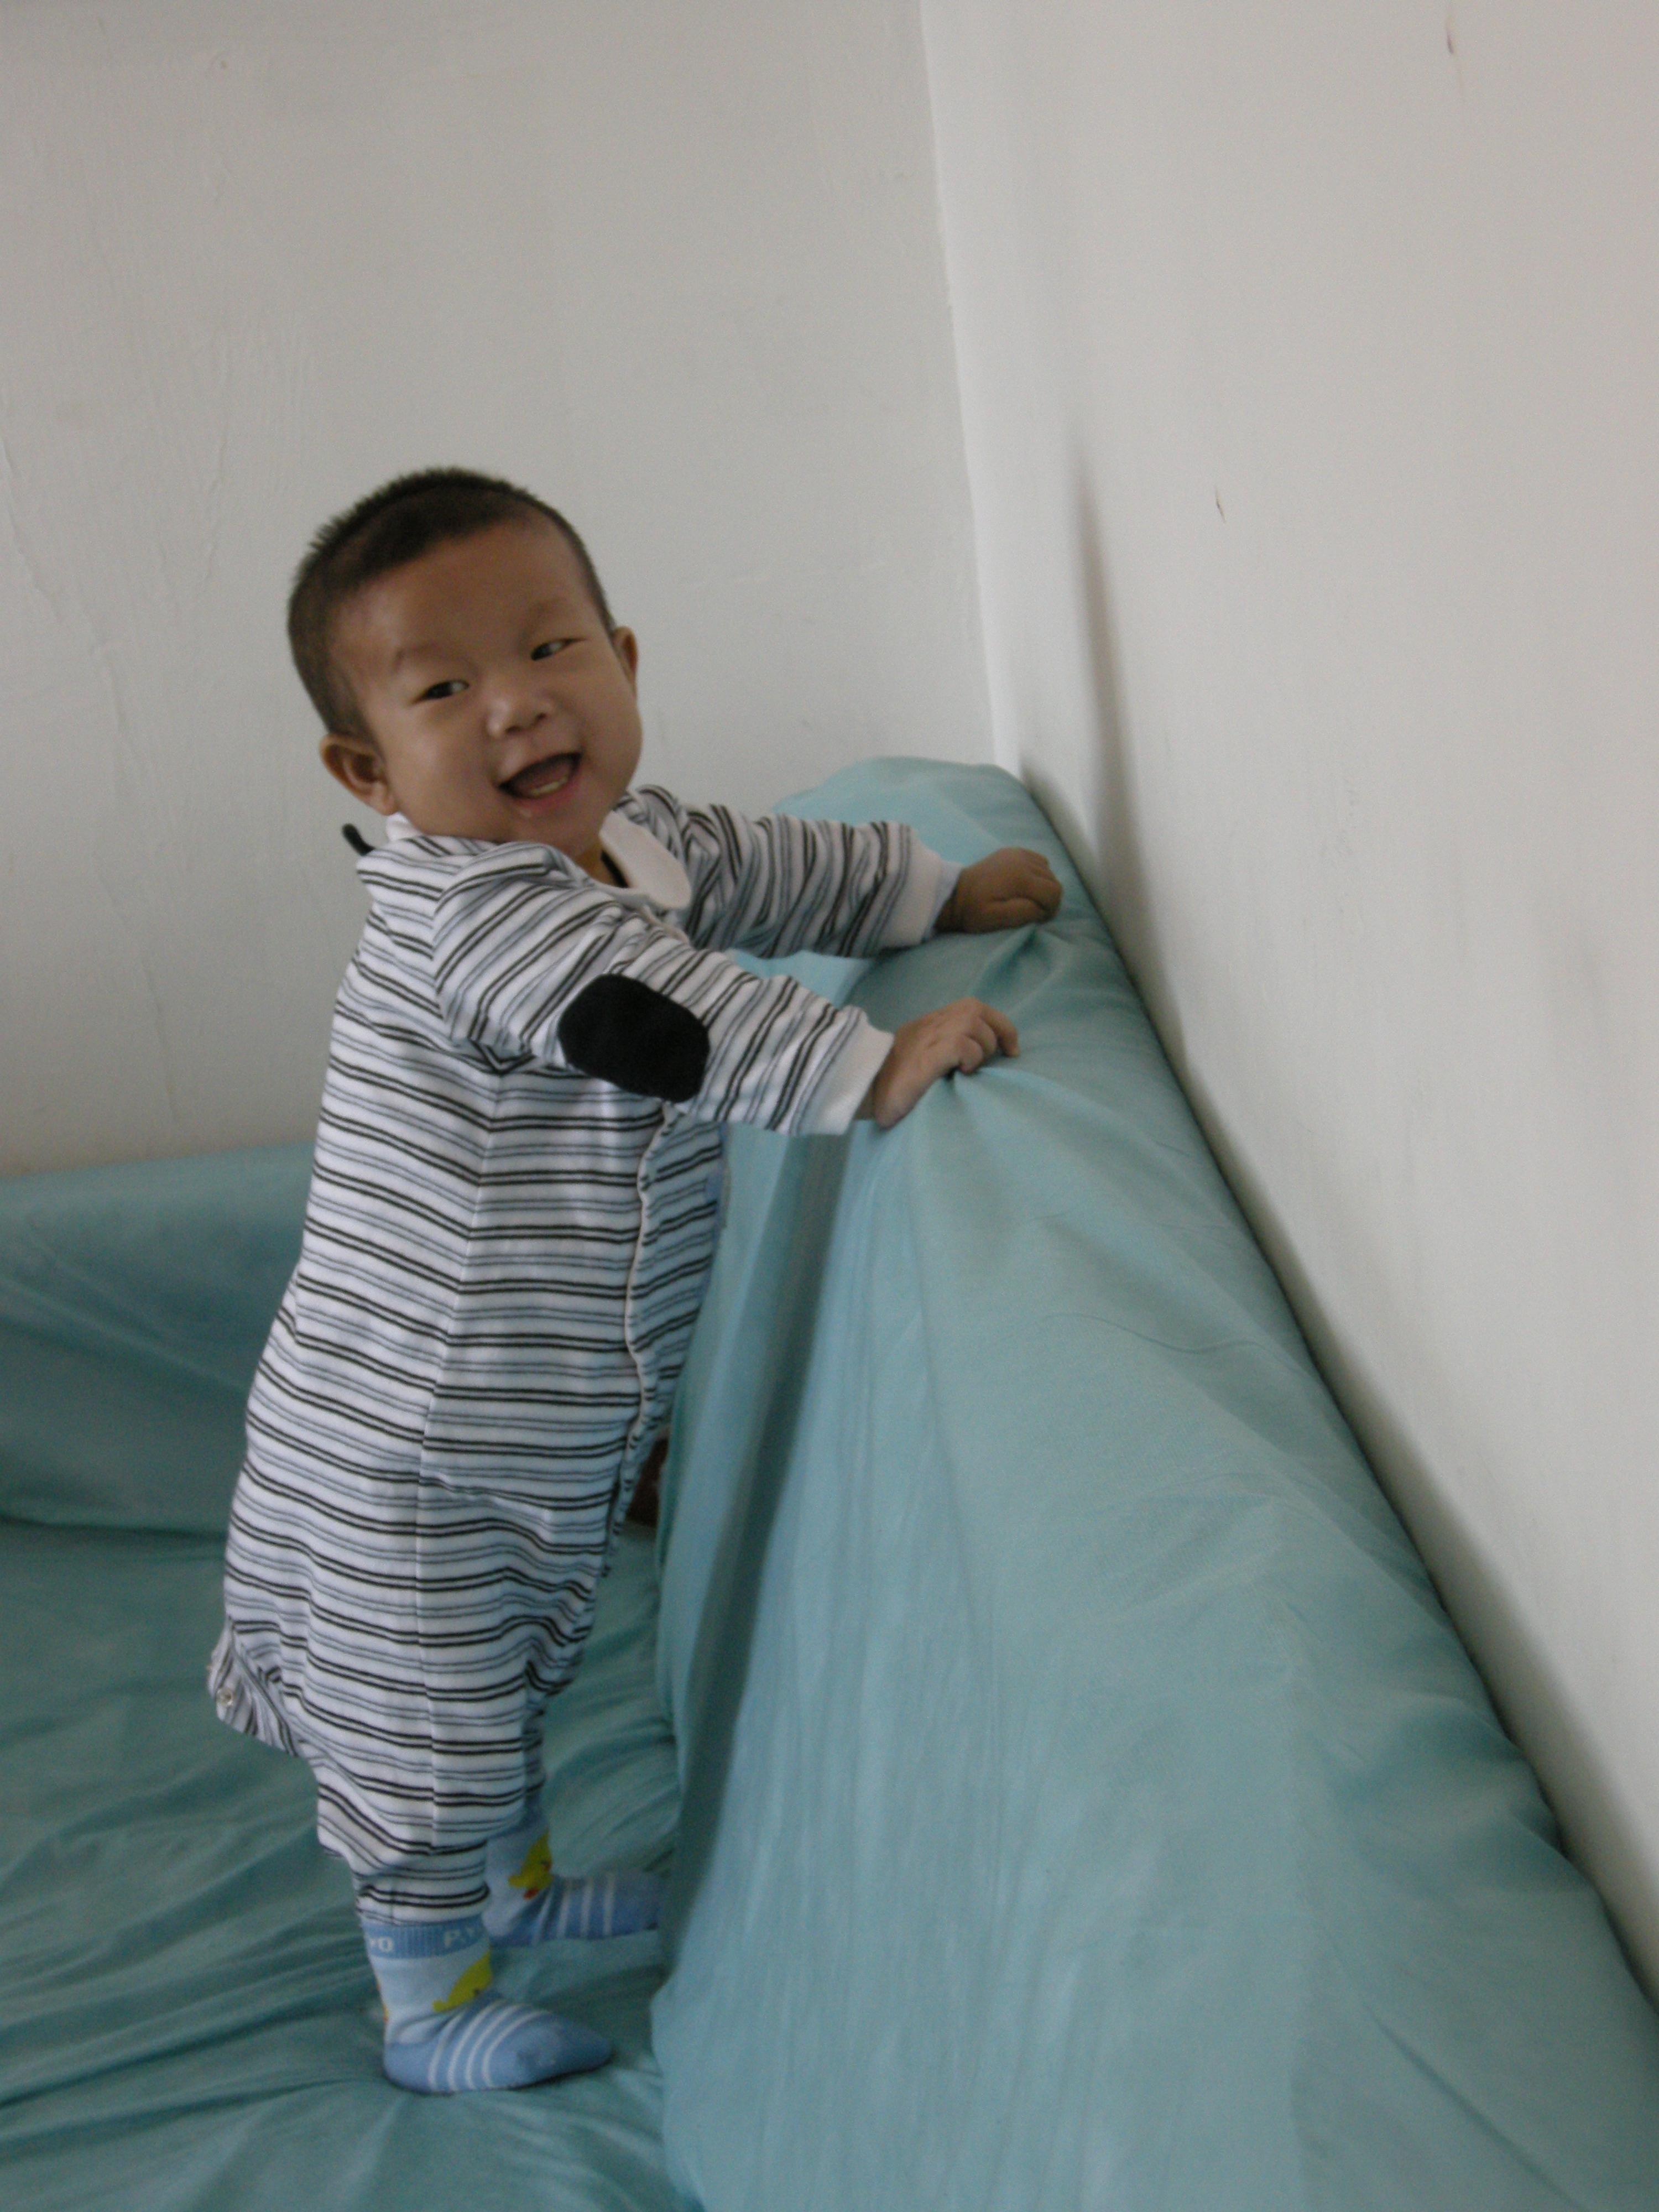 图片来源:http://1831.img.pp.sohu.com.cn/images/2008/5/7/0/8/11a63588873.jpg